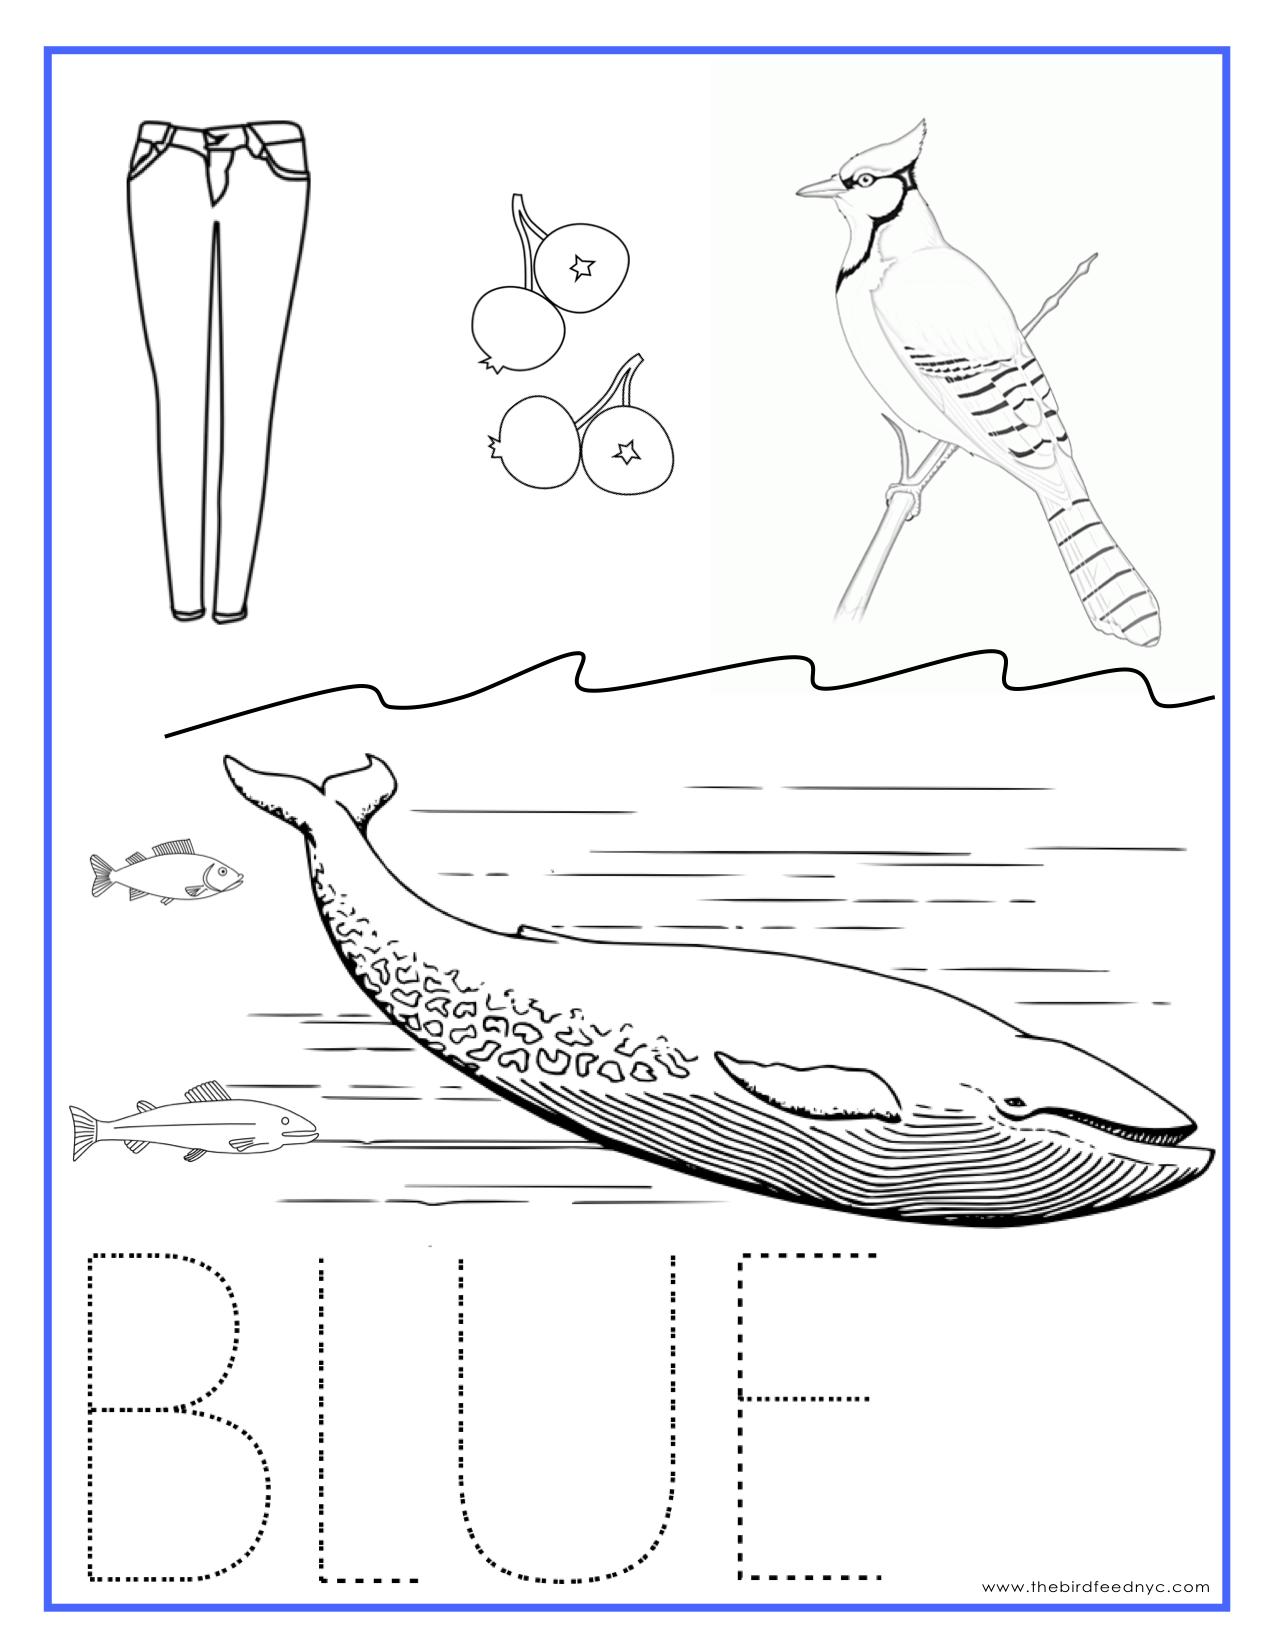 Color Blue Kindergarten Coloring Pages